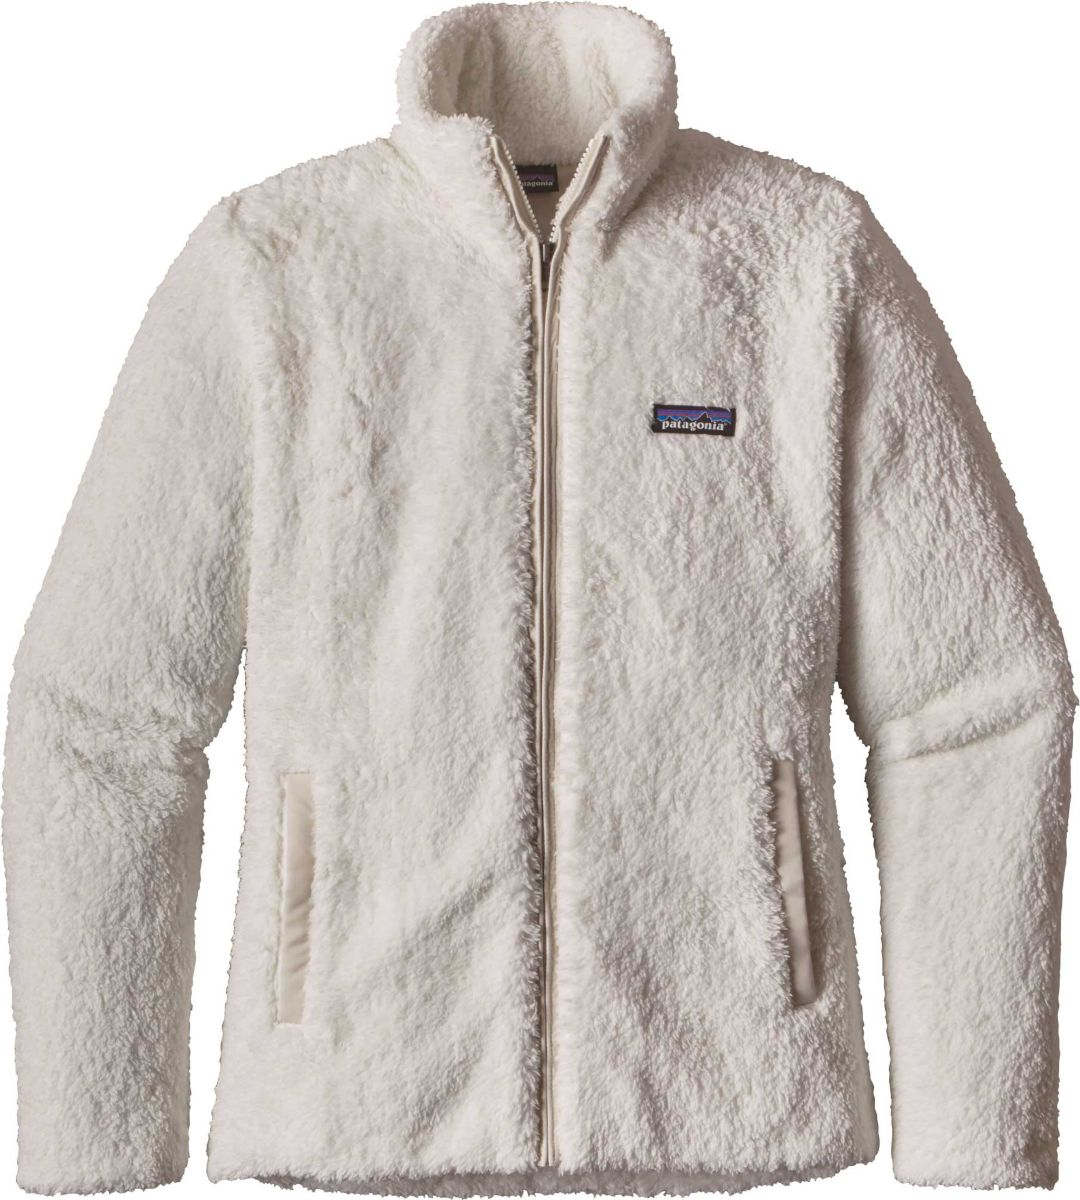 4a9998ee Patagonia Women's Los Gatos Fleece Jacket | DICK'S Sporting Goods